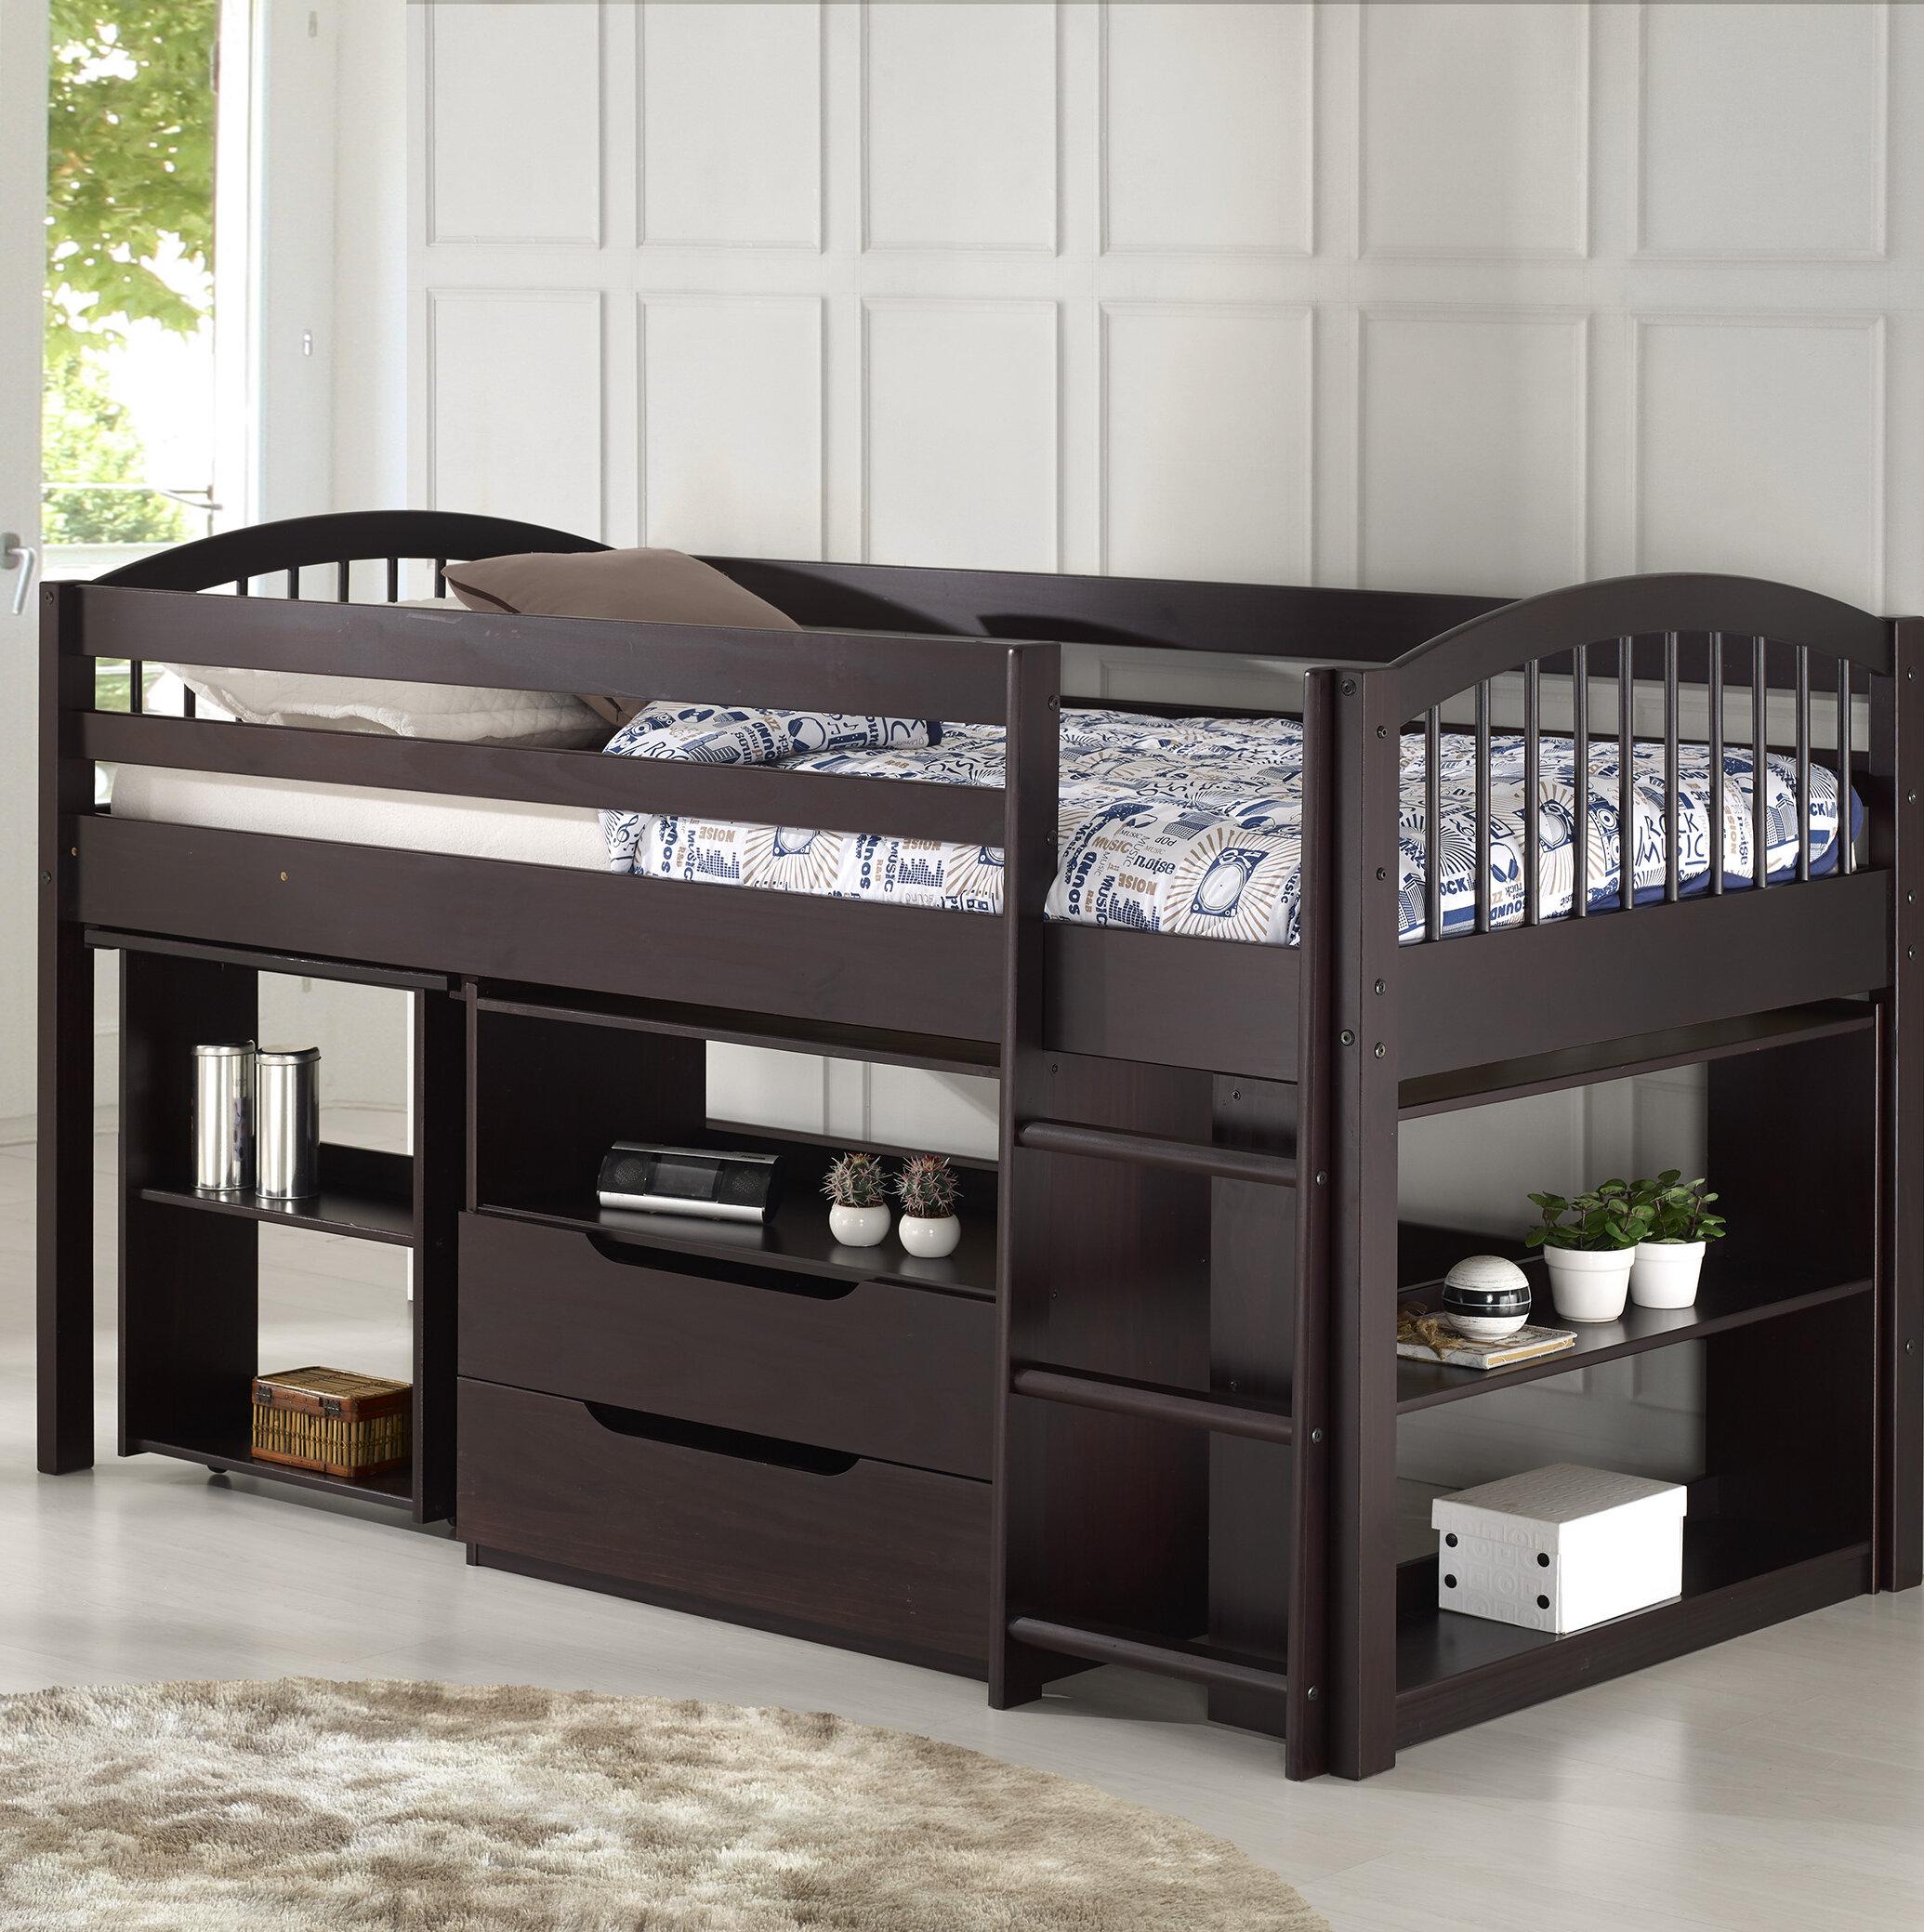 Zoomie Kids Abigail Twin Loft Bed With Drawers | Wayfair